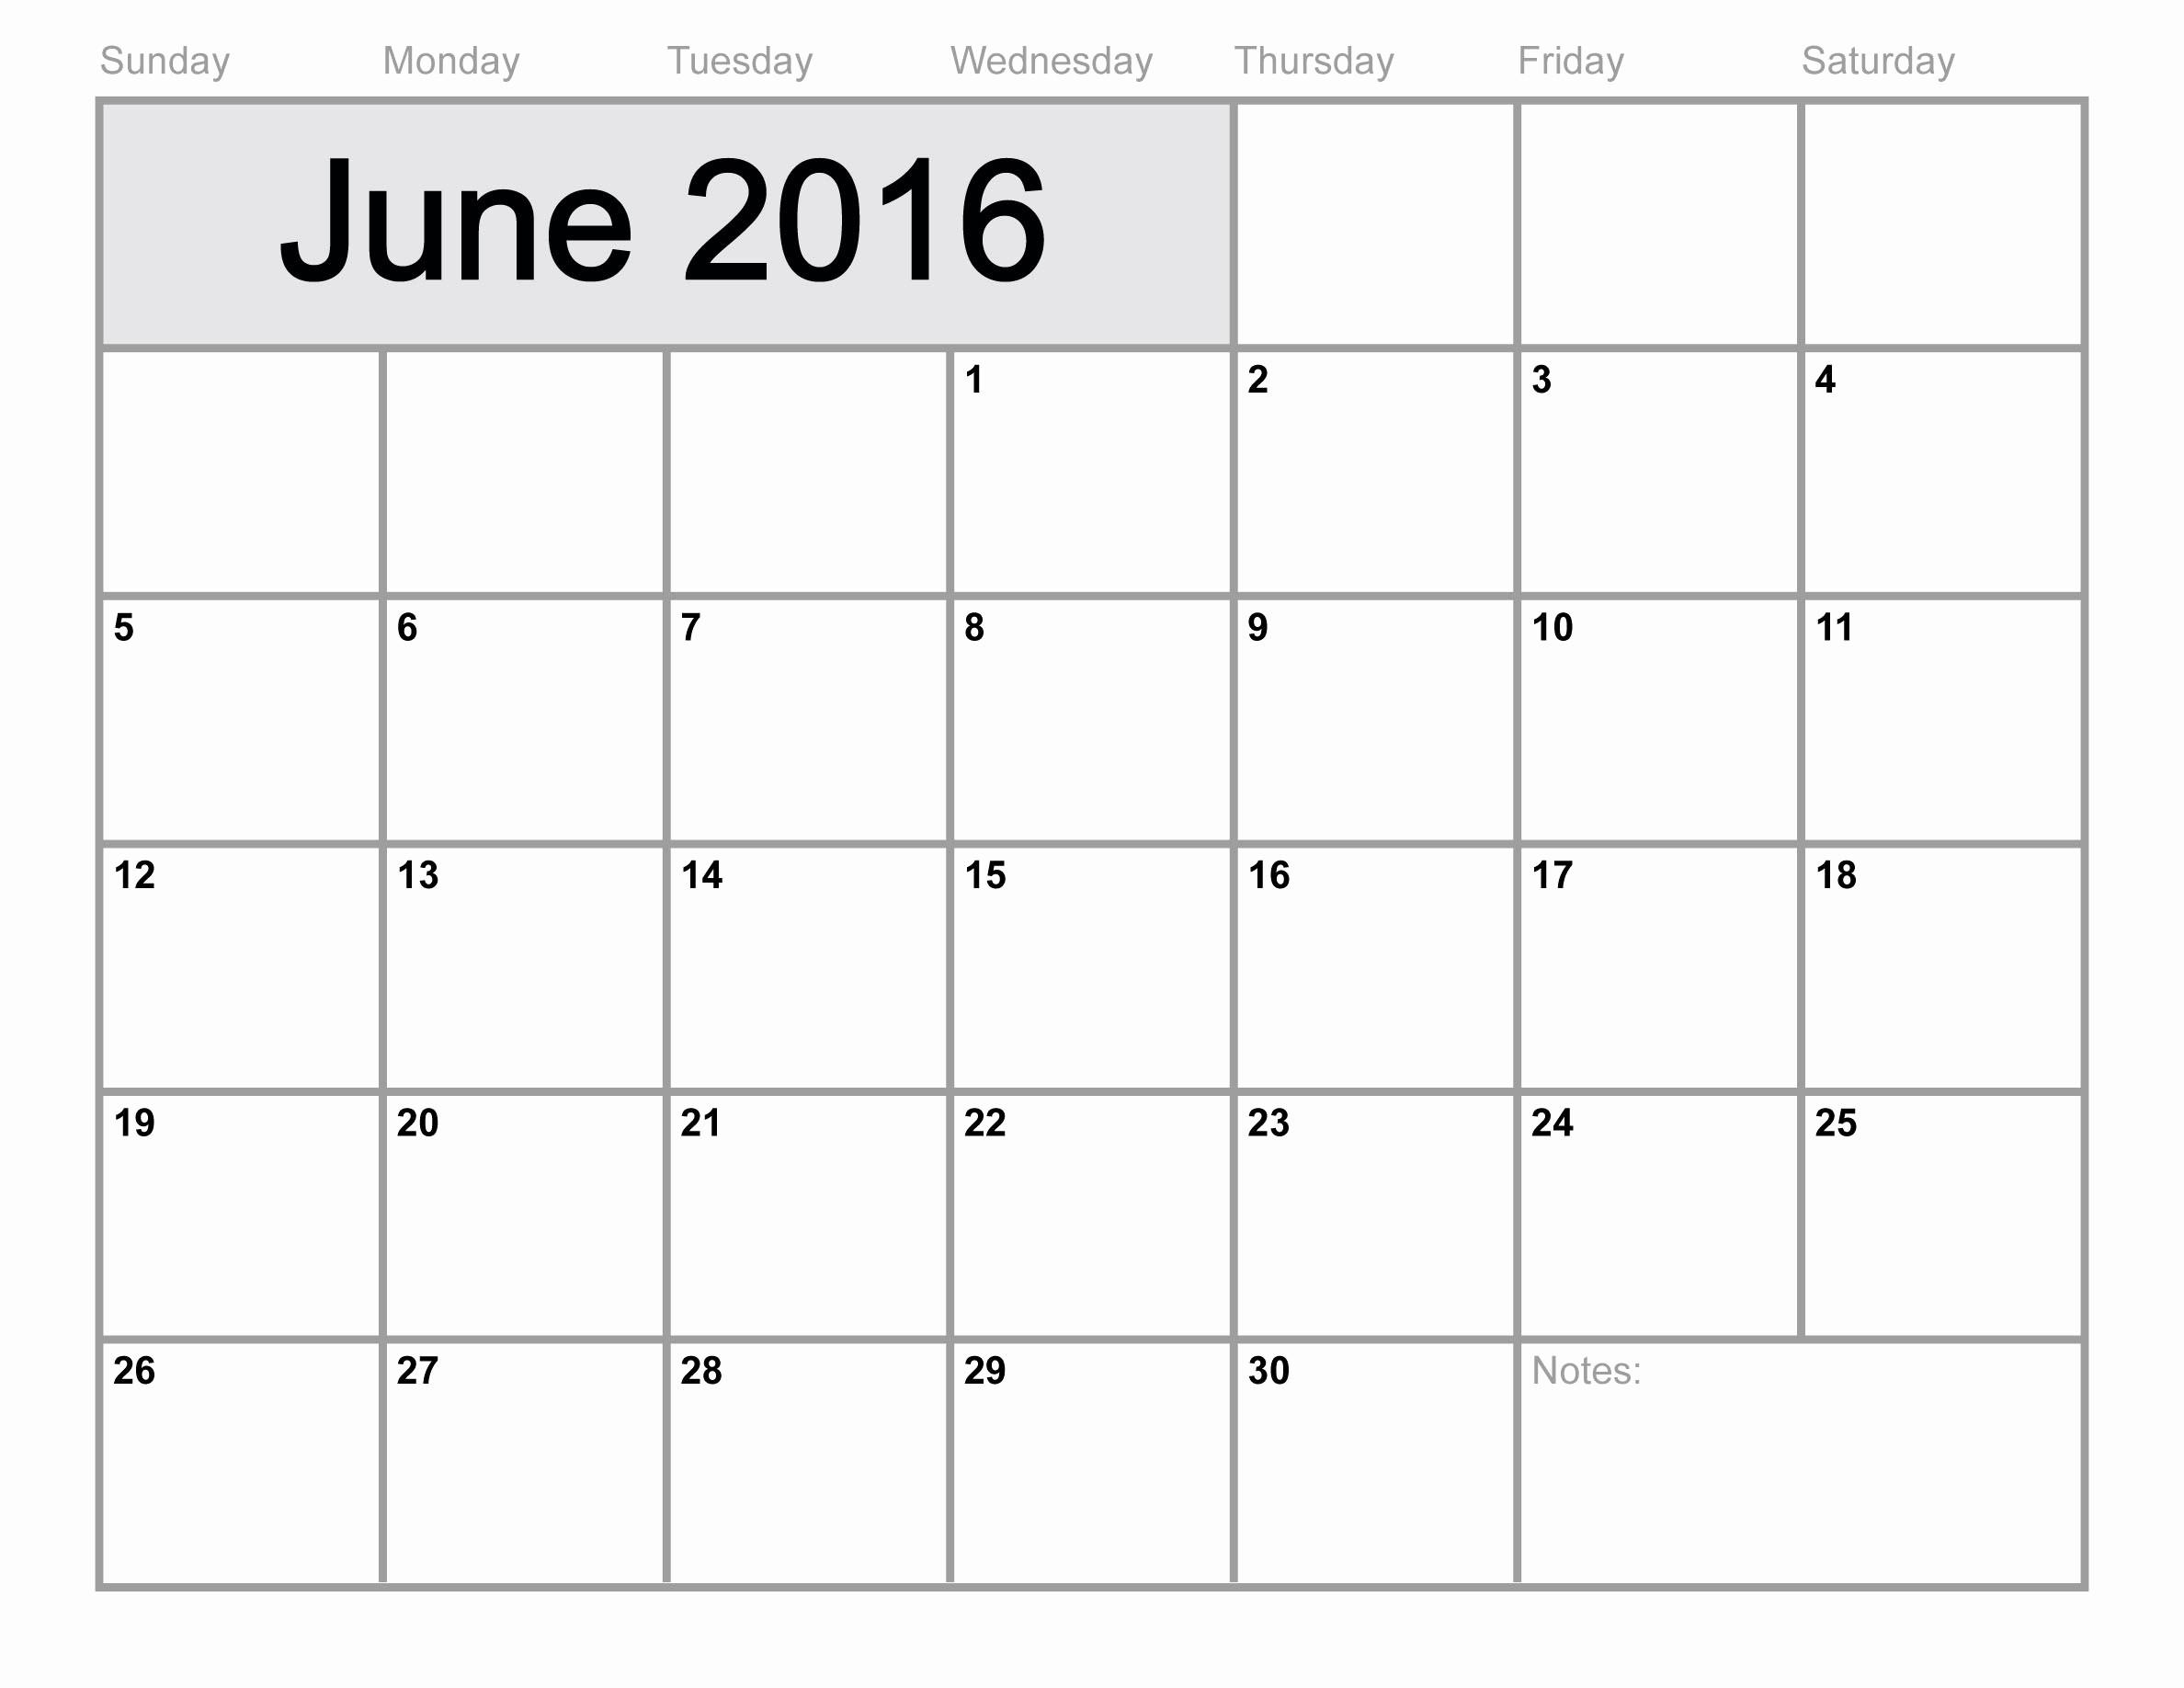 Free Printable Calendars 2016 Templates New June 2016 Printable Calendar Blank Templates